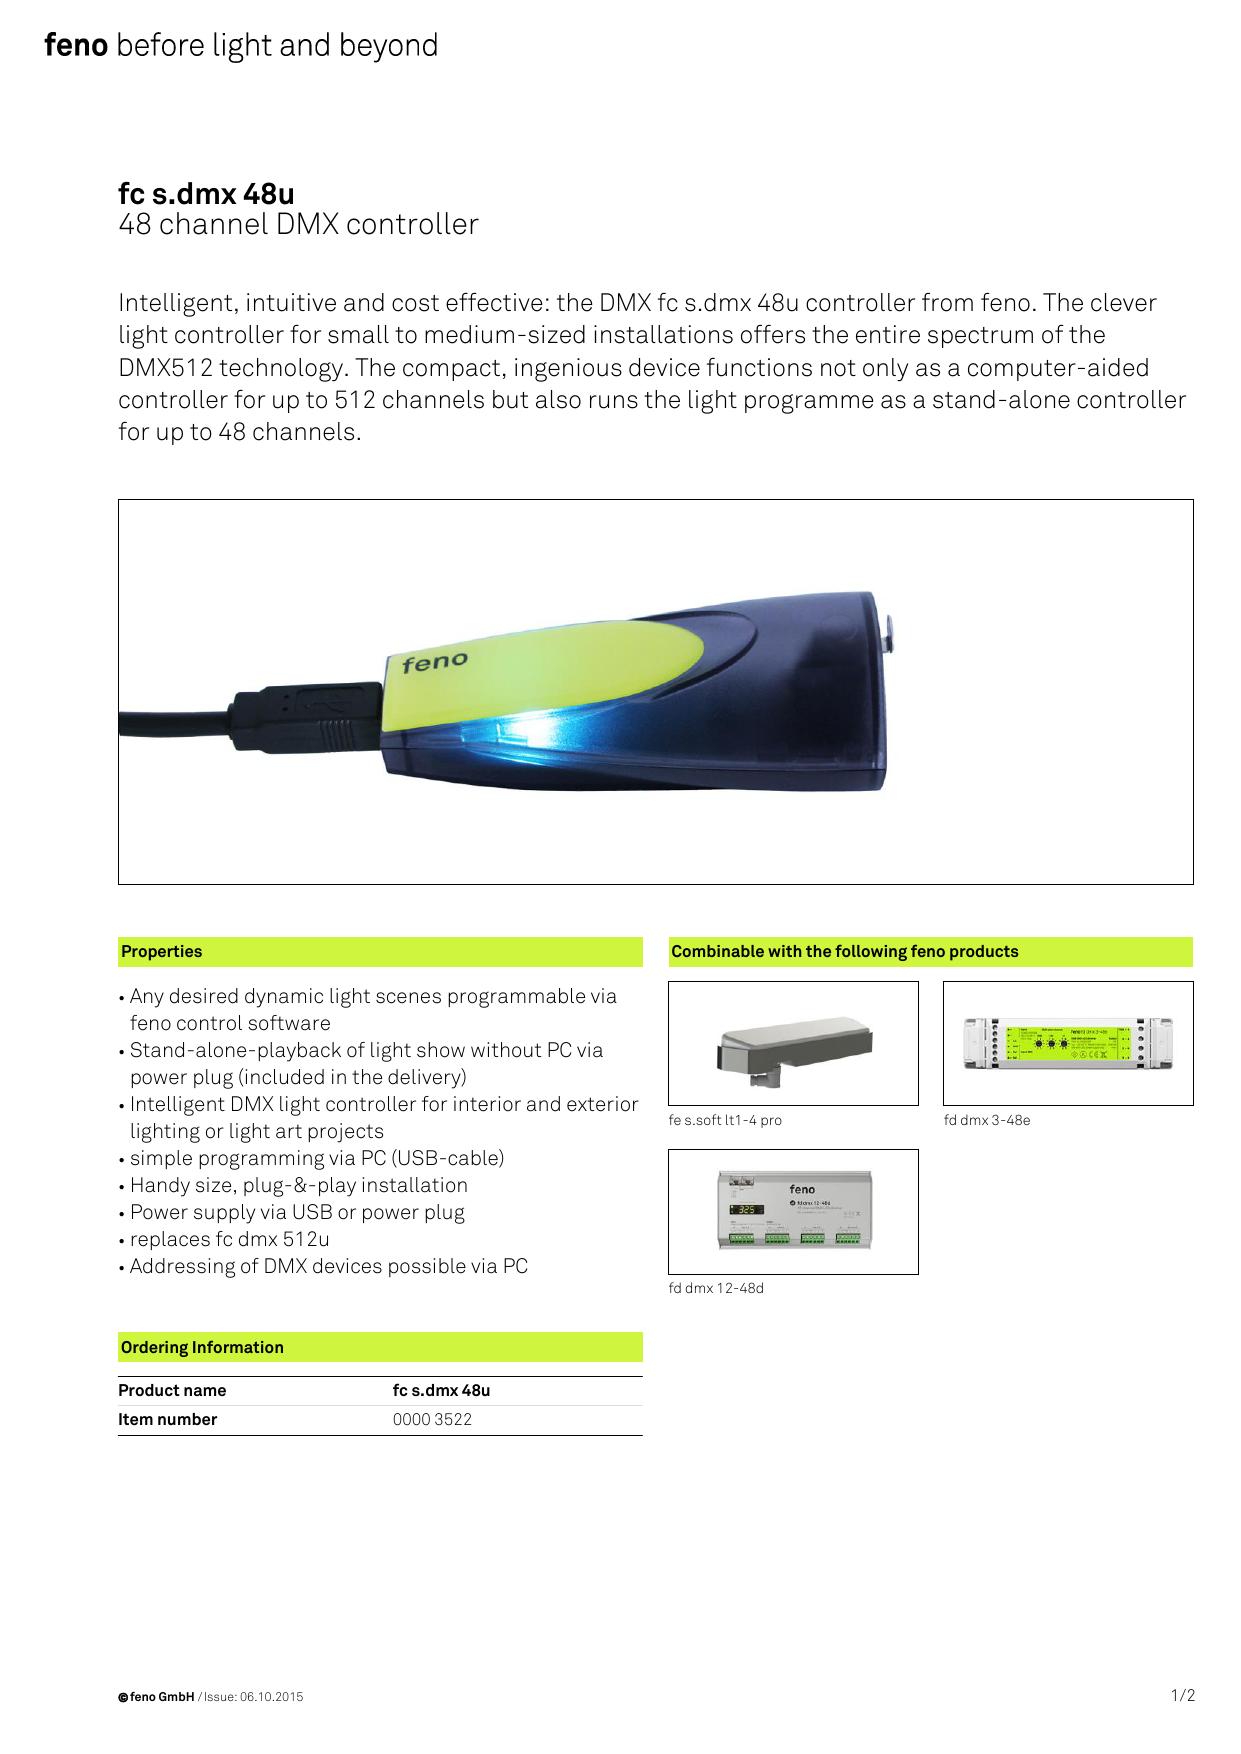 fc s.dmx 48u - Datasheet EN | manualzz.com on dmx soldering diagram, dmx xlr pinout, dmx control wiring, dmx wiring touch-and-go, programming diagram, dmx cable, dmx wiring guide, dmx rj45 pinout, dmx switch diagram, dmx connectors diagram, dmx lighting diagram, dmx controller hookup diagram,